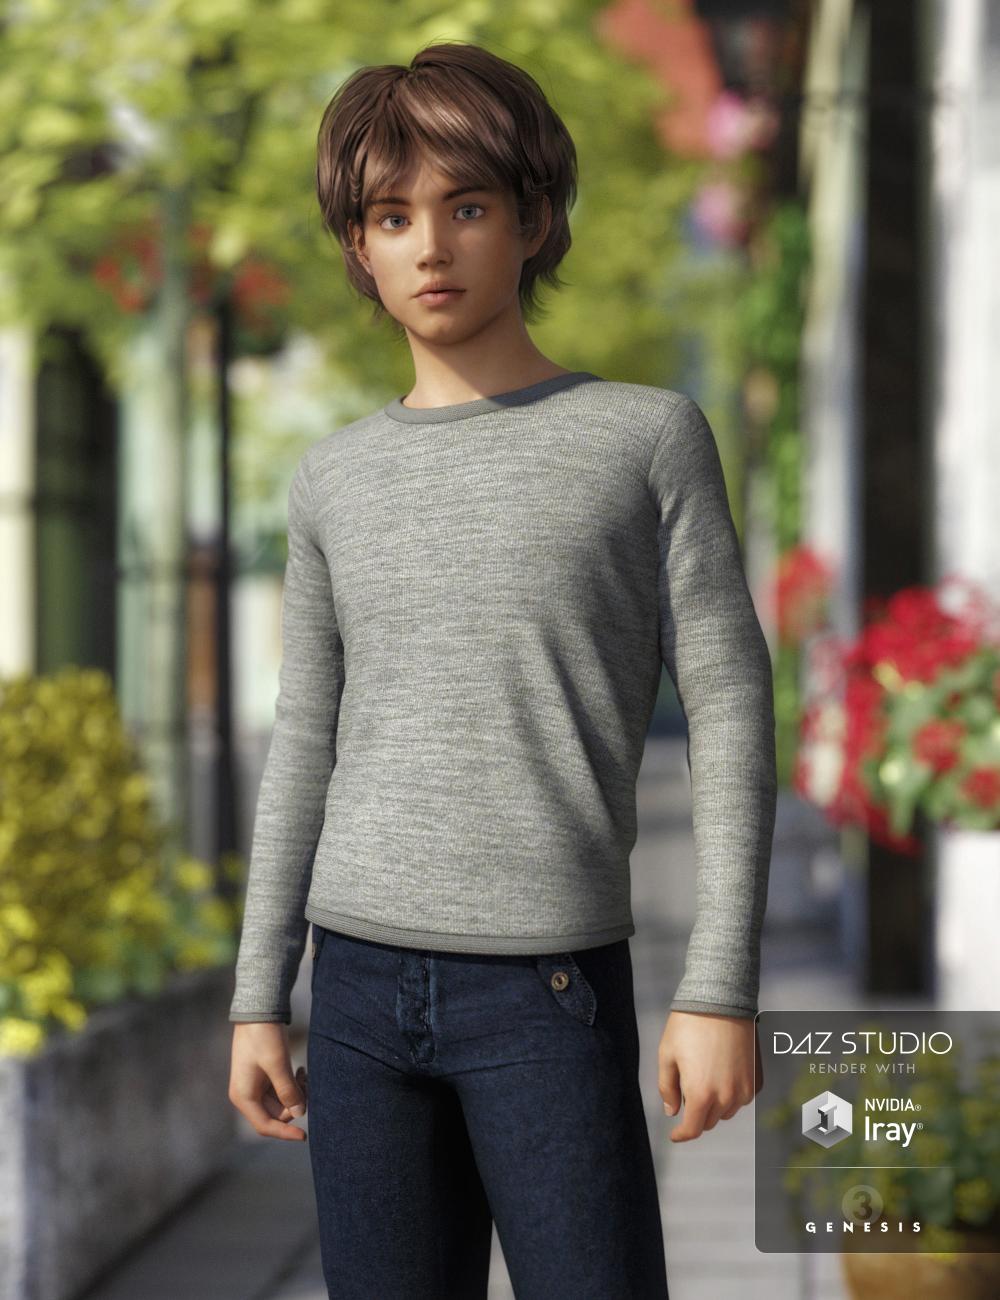 FWSA Max for Tween Ryan 7 by: Fred Winkler ArtSabby, 3D Models by Daz 3D